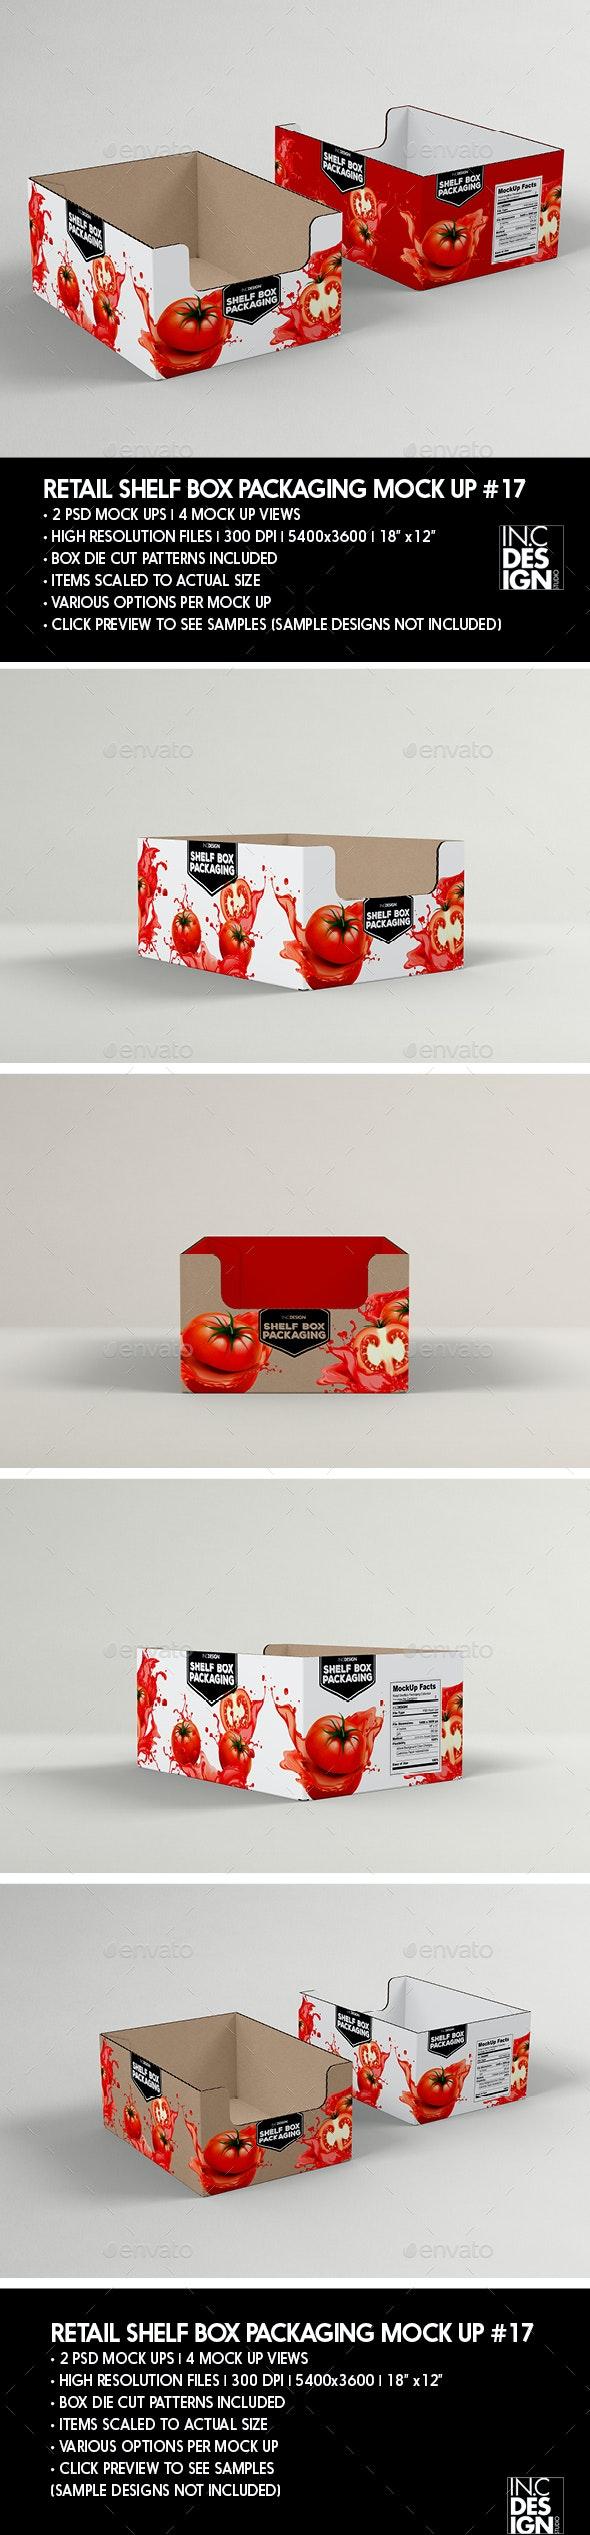 Retail Shelf Box Packaging MockUp No.17 - Packaging Product Mock-Ups